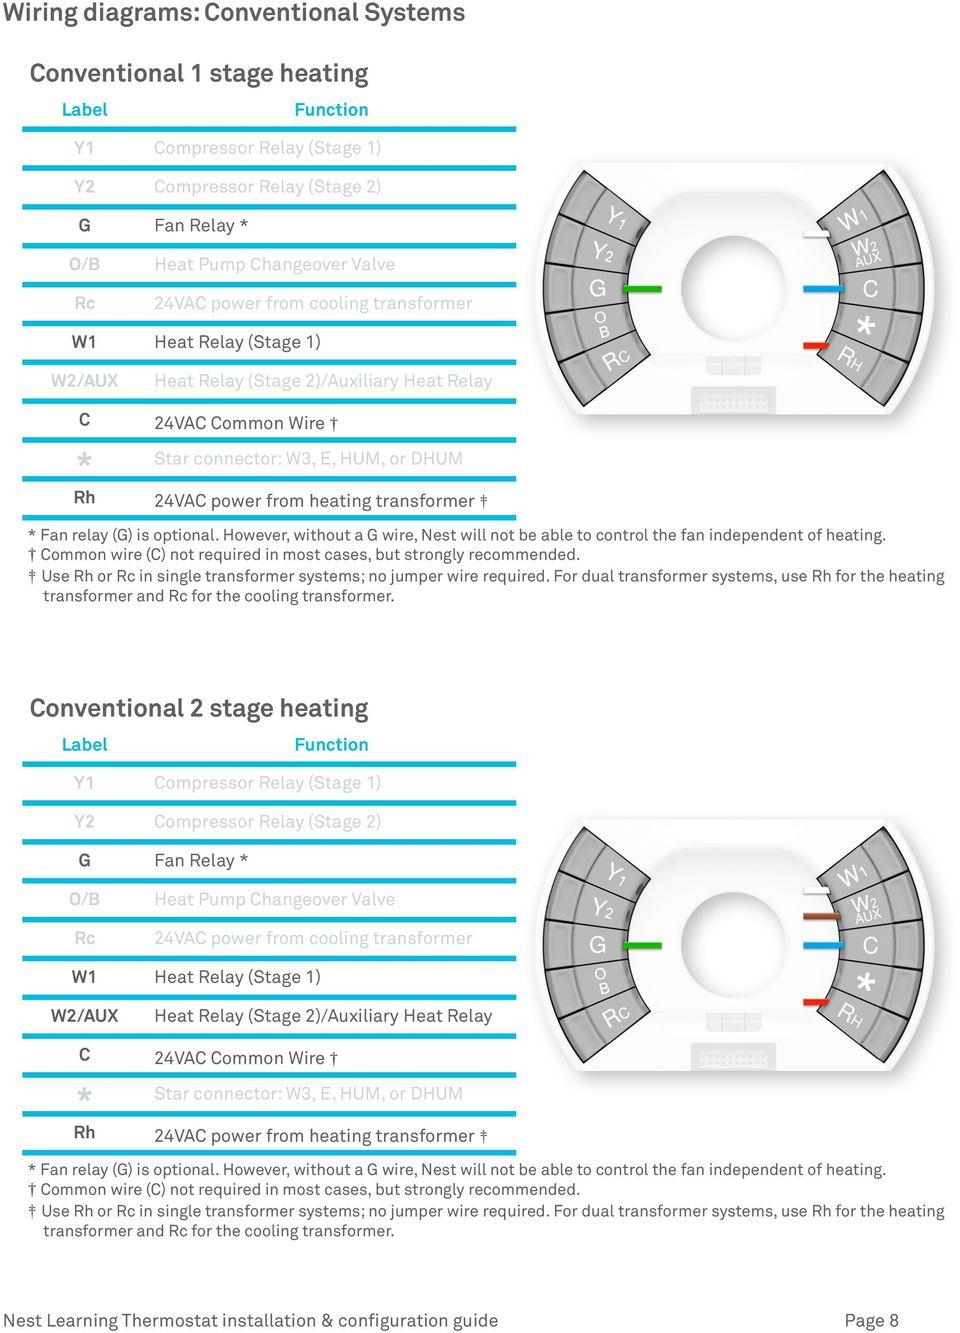 MK 40] Nest Rc Or Rh Wiring Diagram Wiring Diagram